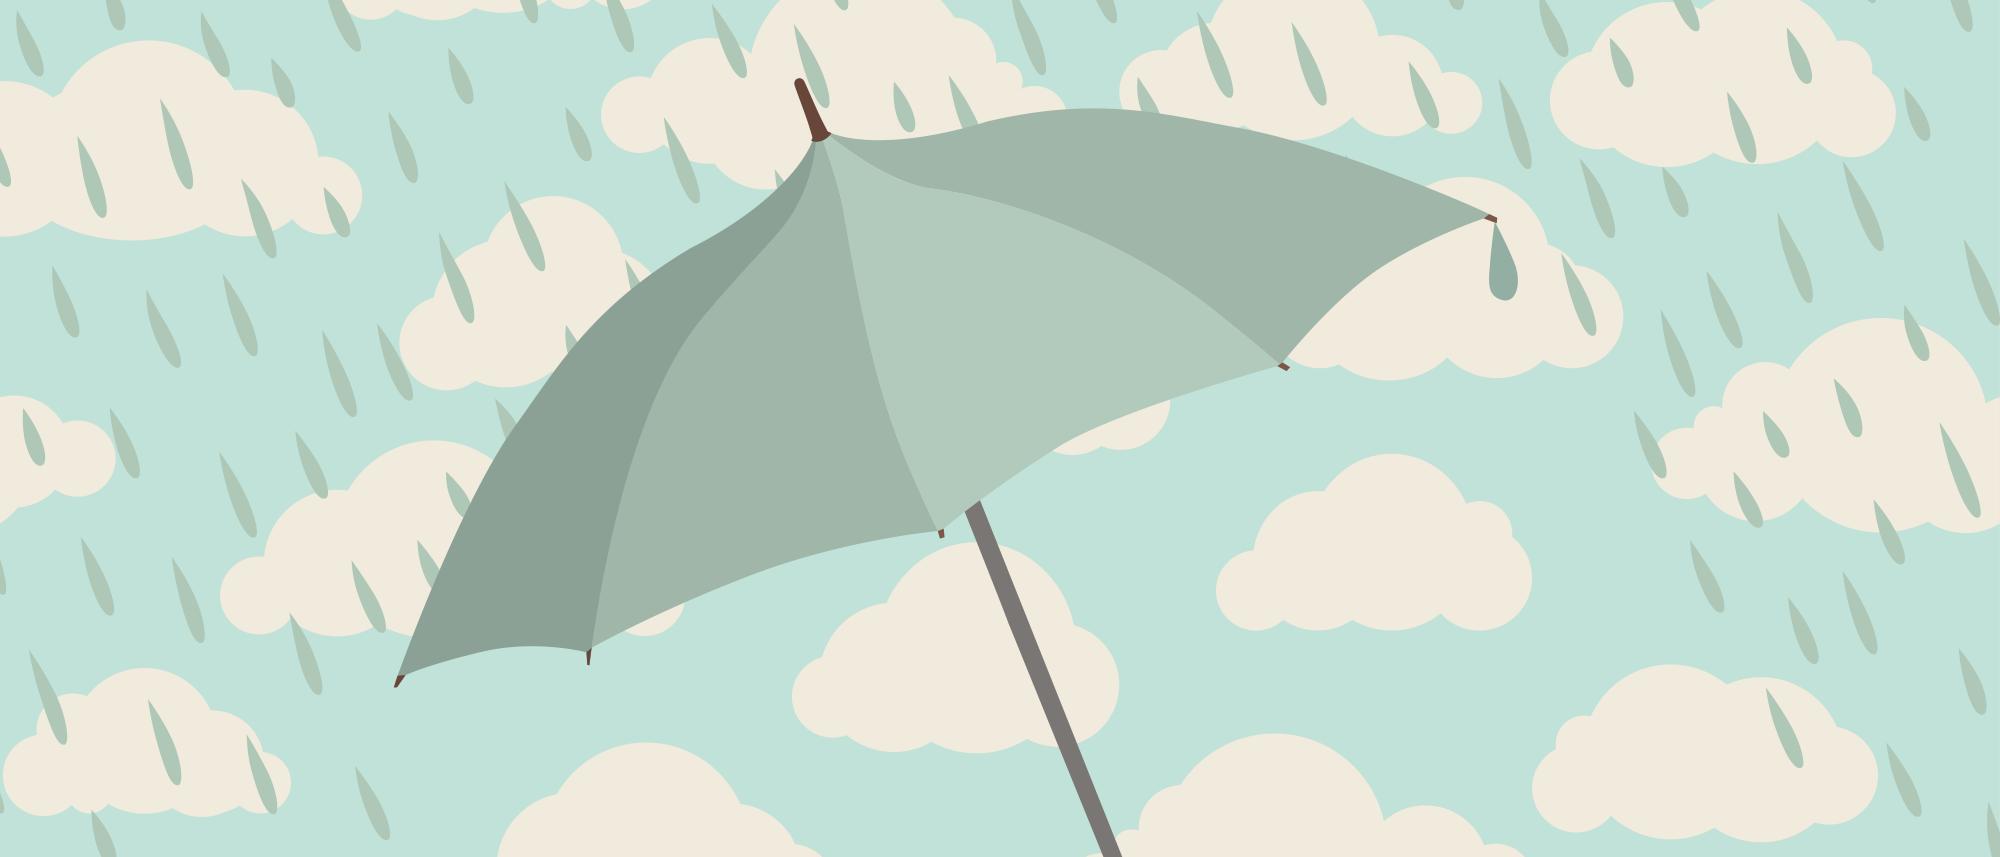 Ein Regenschirm vor verregnetem Himmel